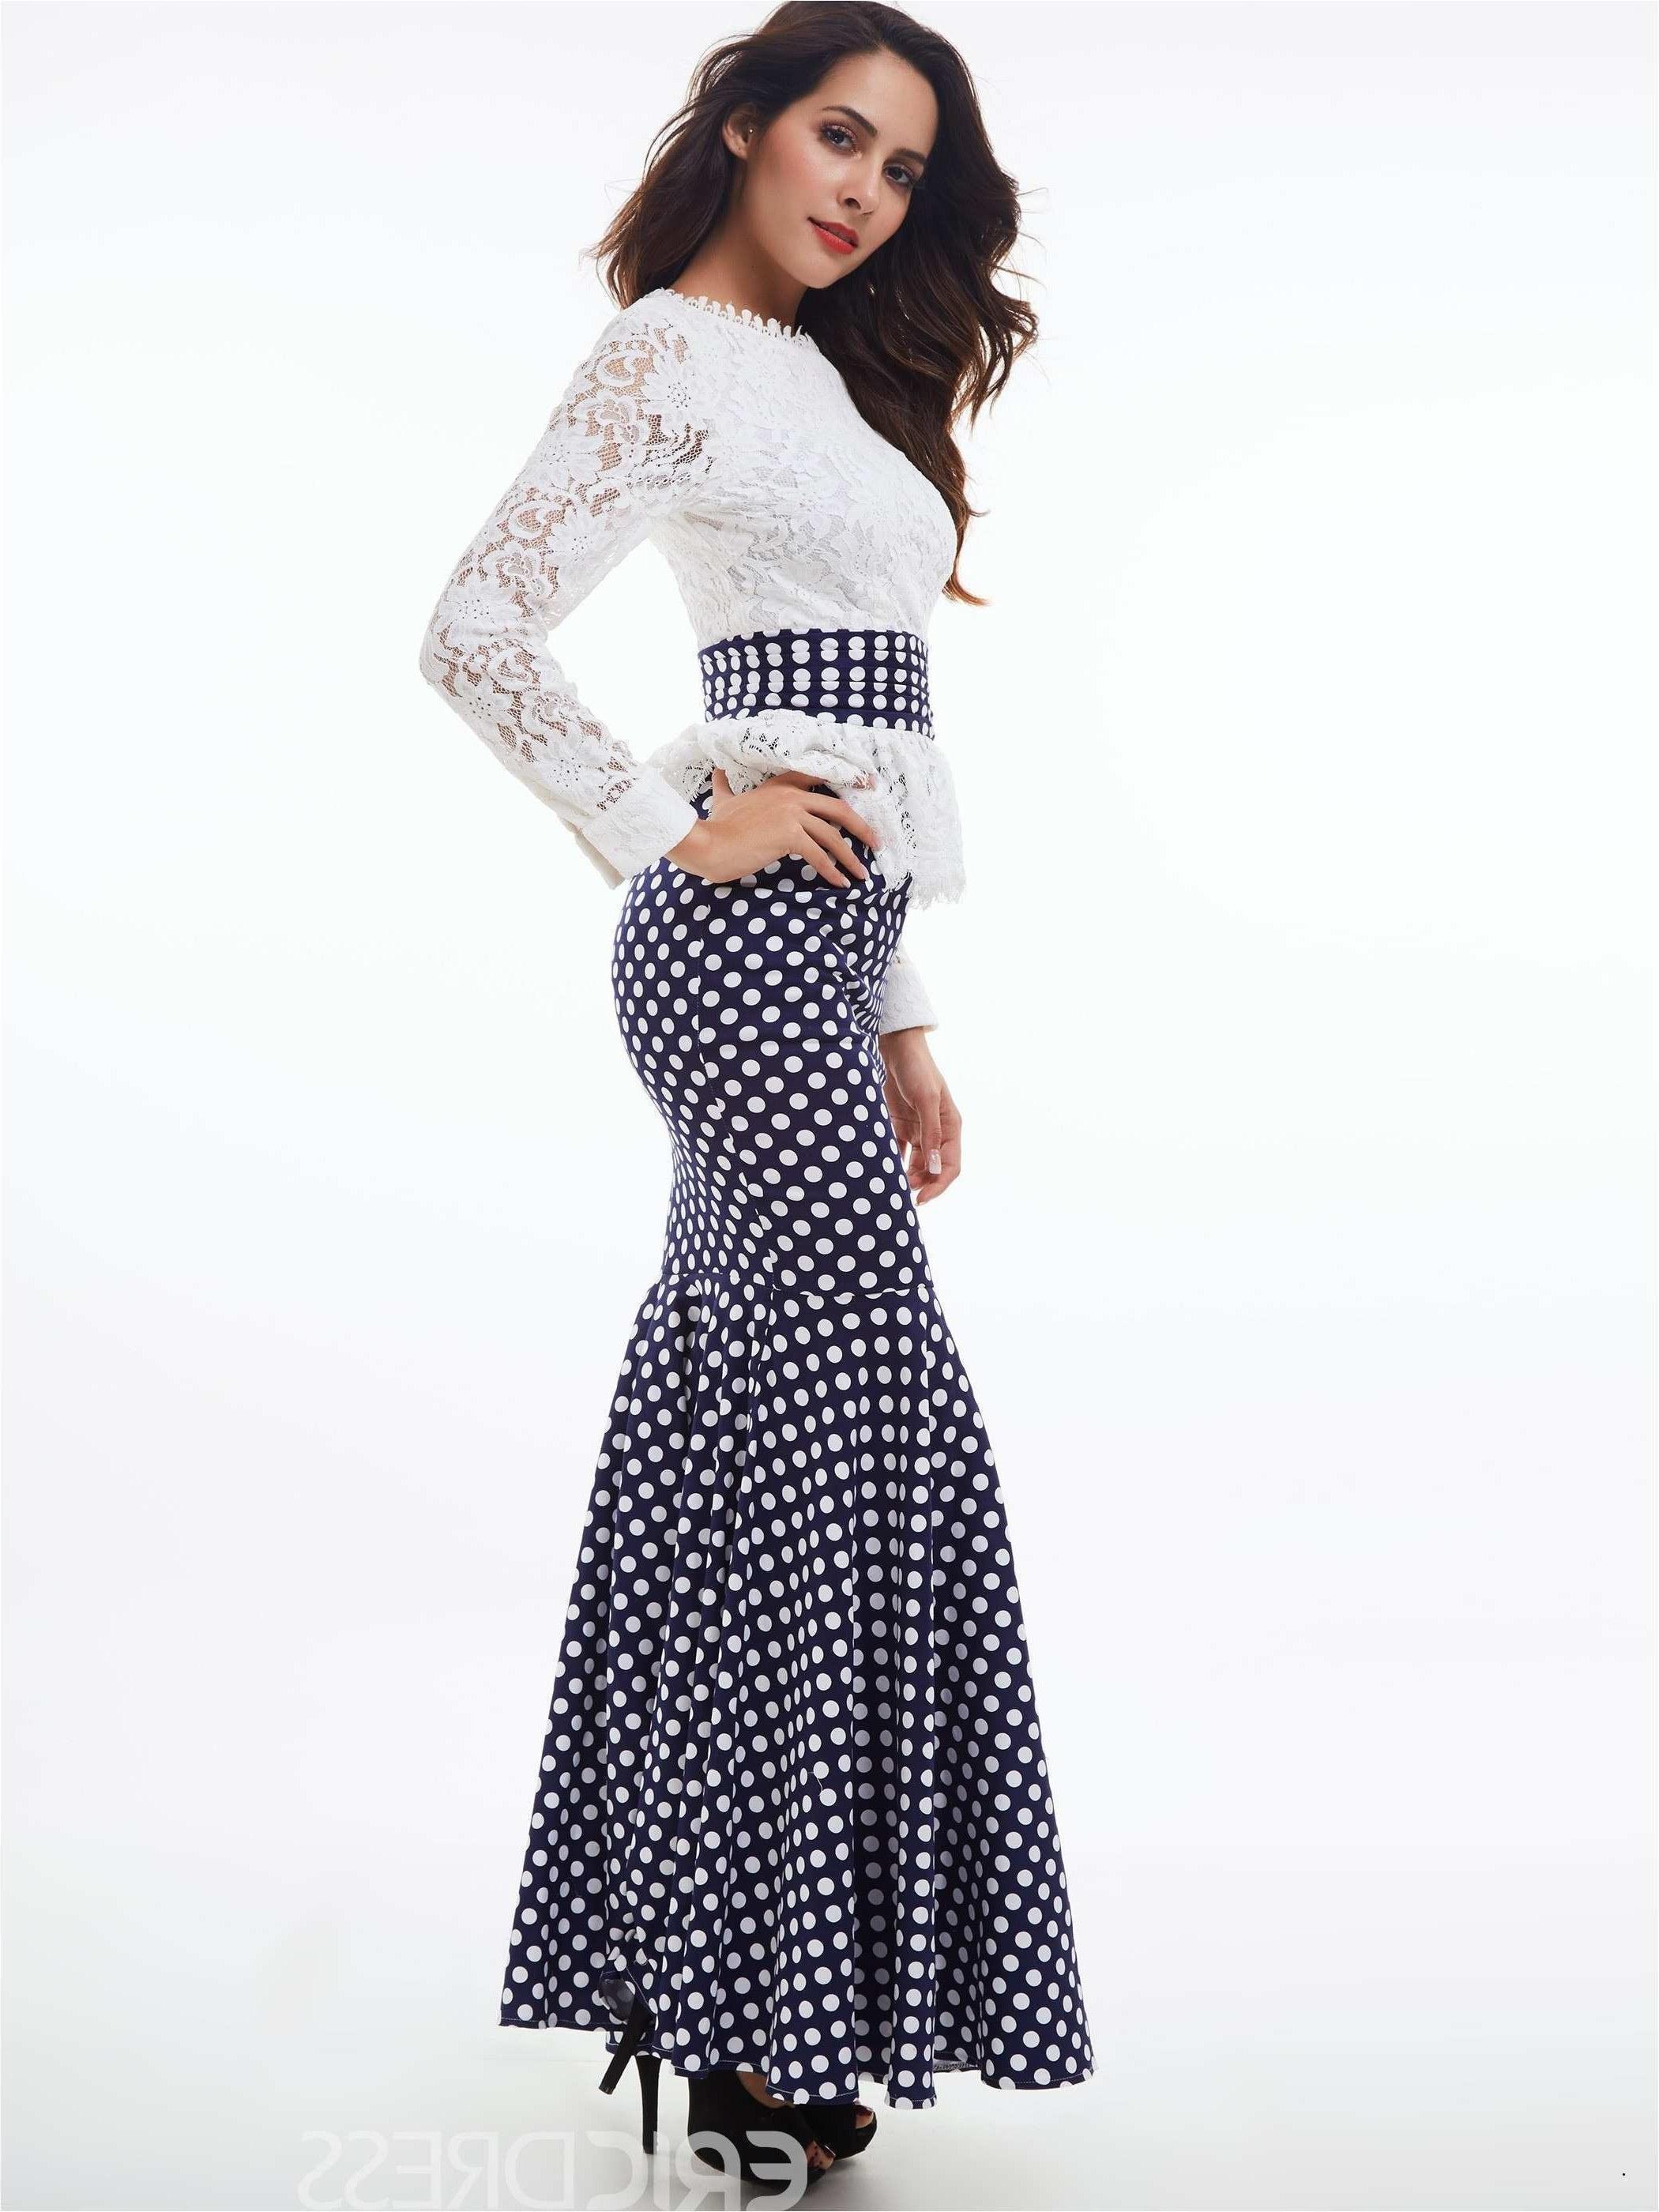 Model Busana Pengantin Hijab Etdg Ecehispanic